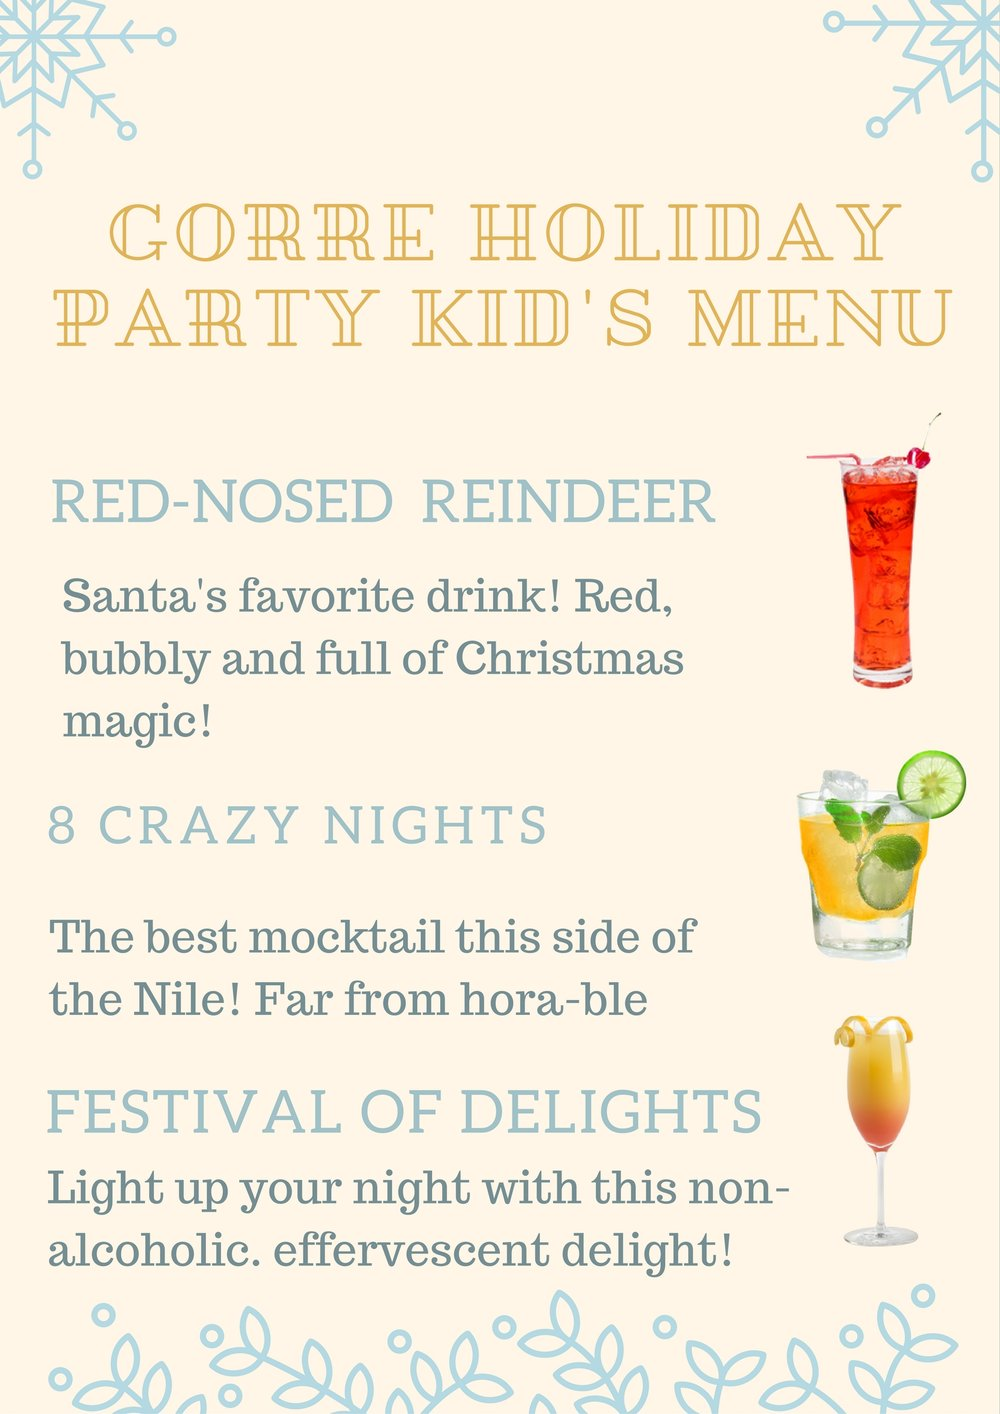 Gorre Party Kids menu.jpg